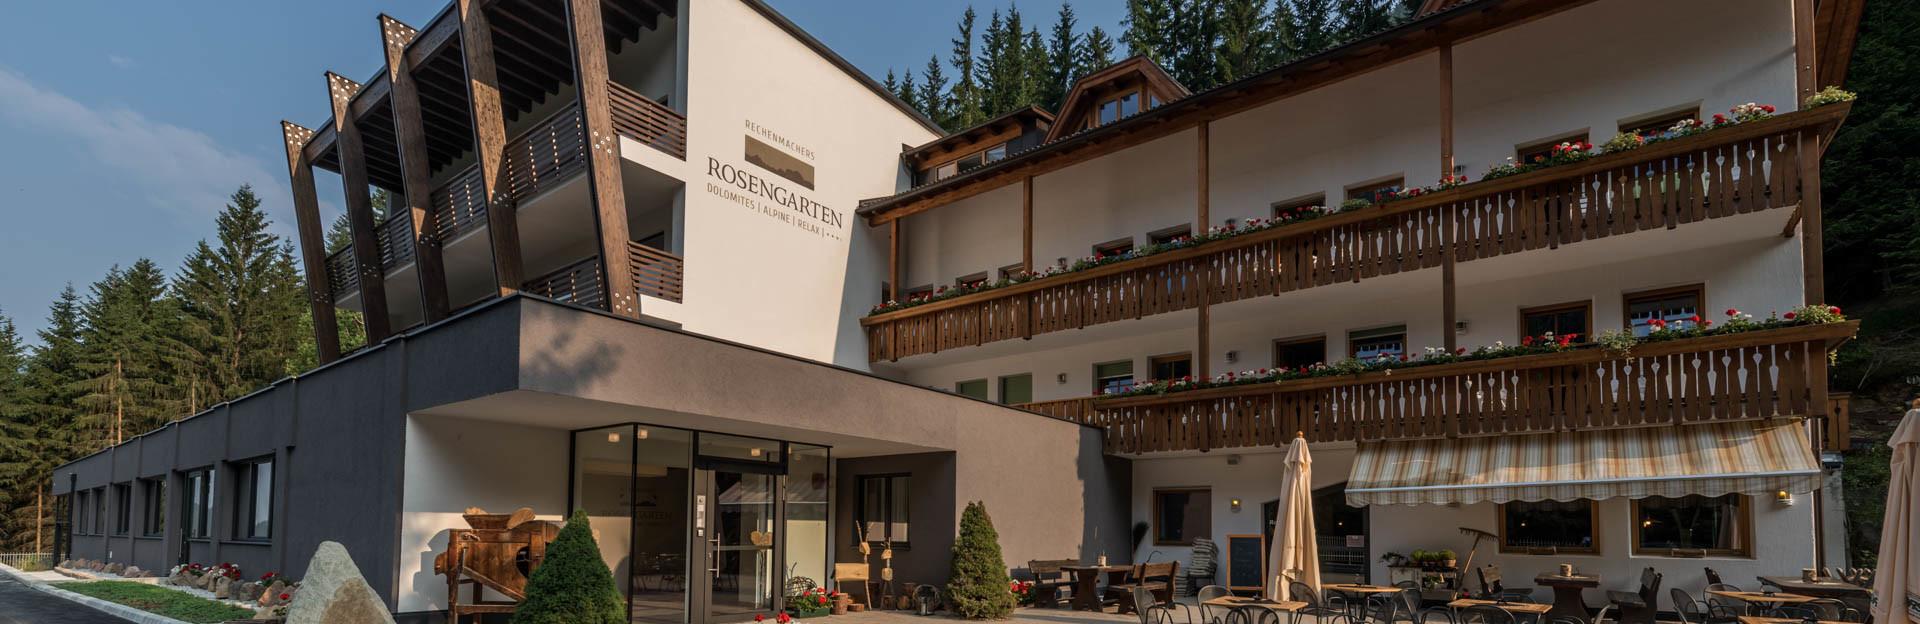 Hotel Rosengarten Welschnofen - 0013